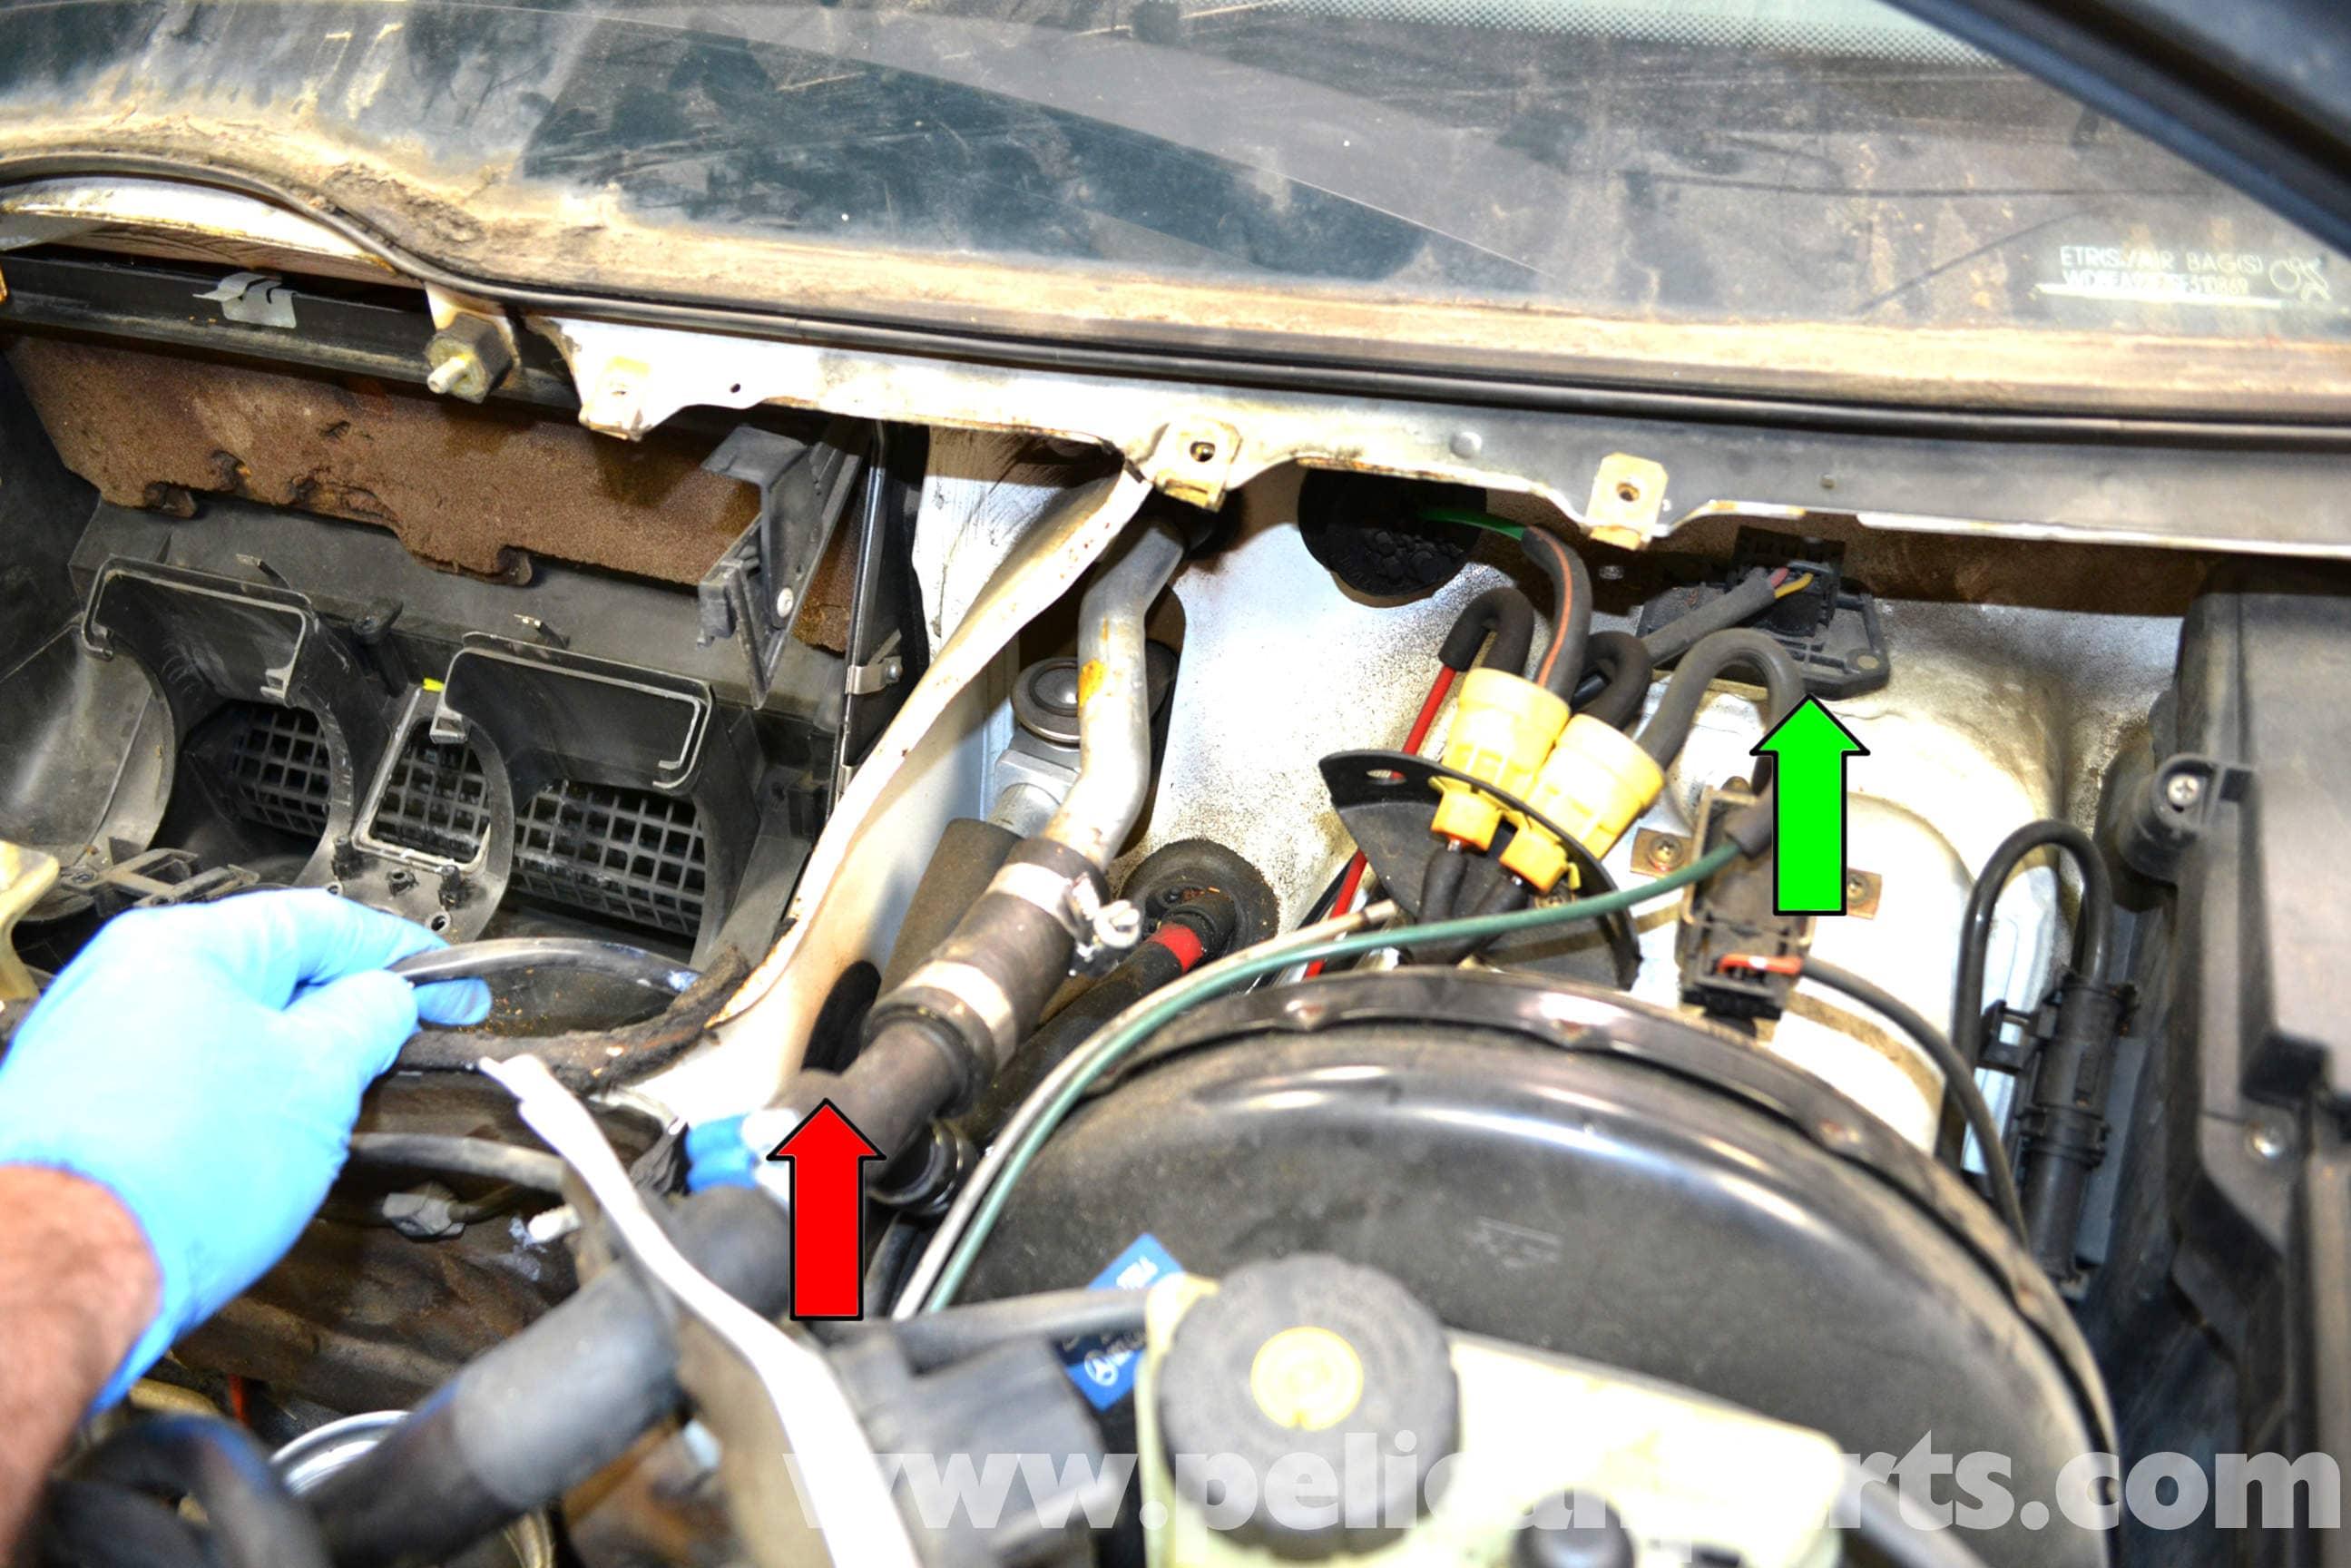 Mercedes Benz 1995 E320 Wiring Diagram Mercedes Benz W124 Hvac Resistor Replacement 1986 1995 E